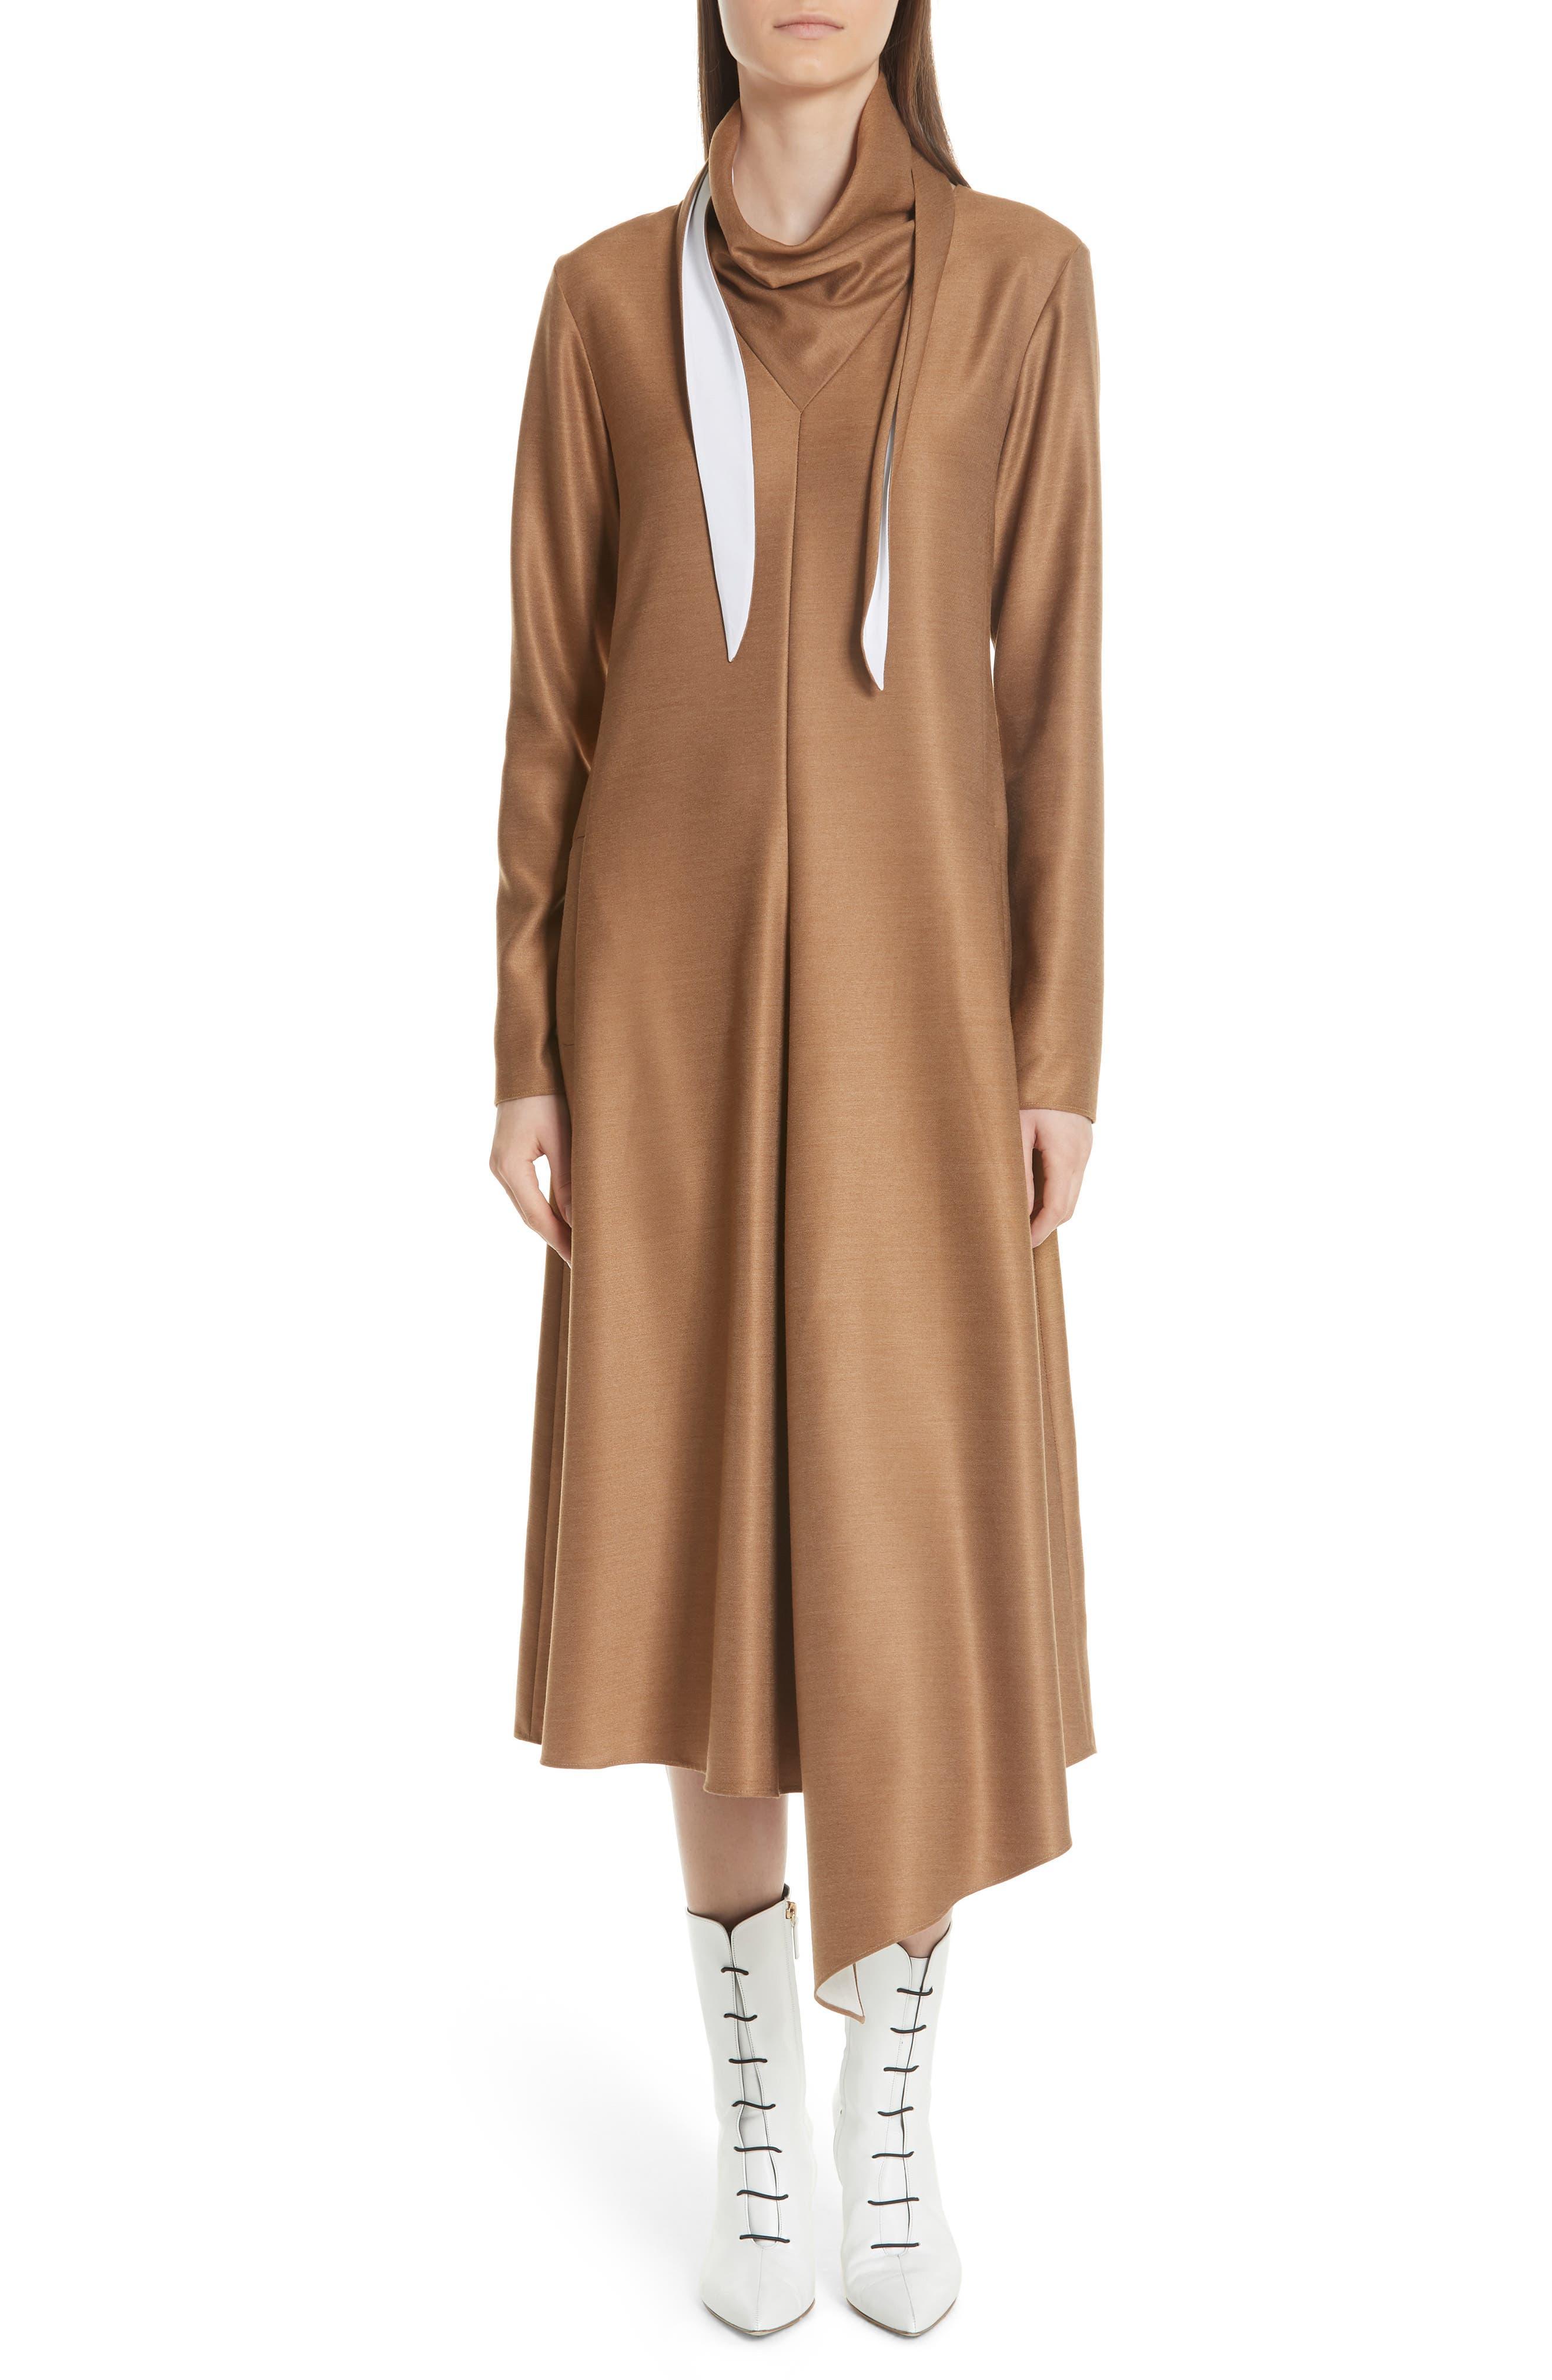 Tibi Bandana Neck Dress, Brown